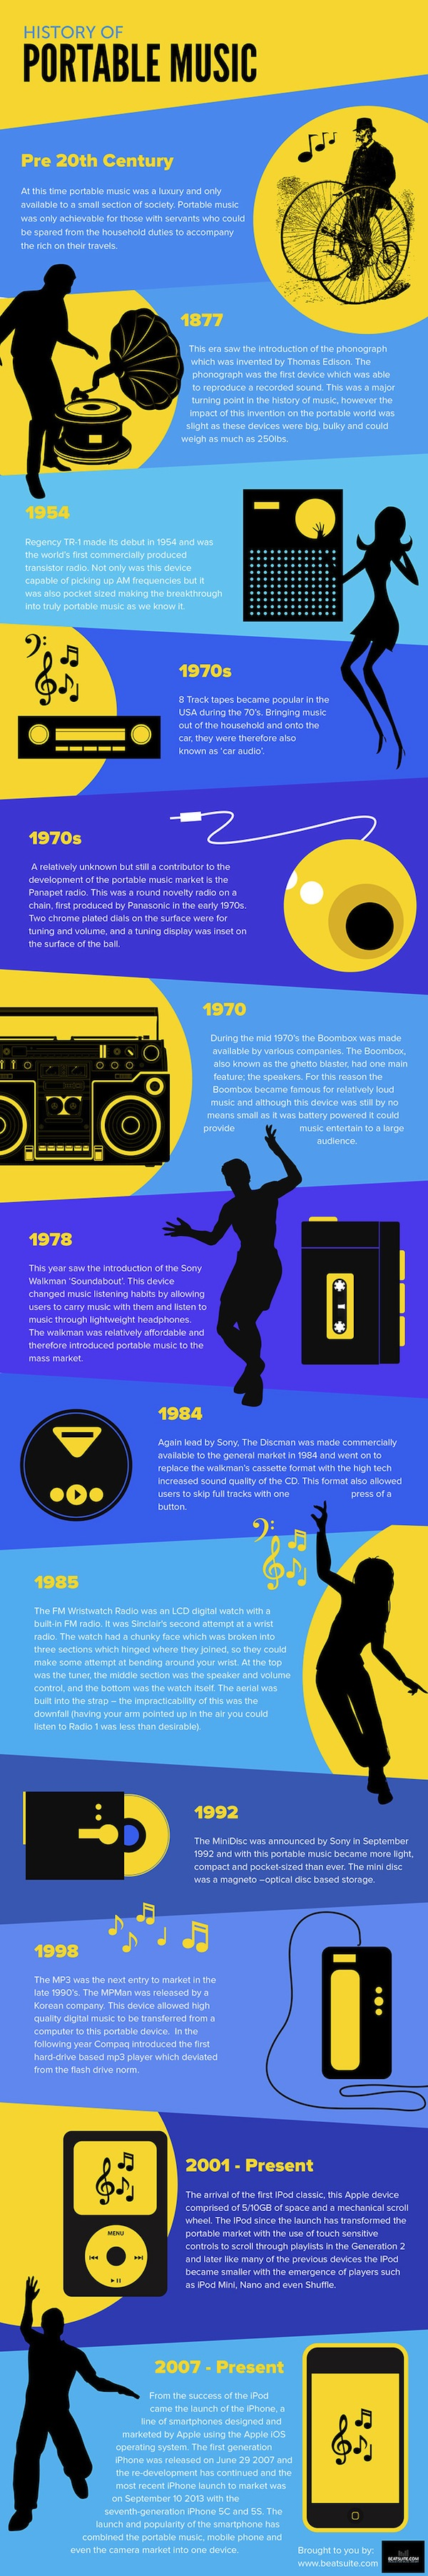 History-portable-music_v1